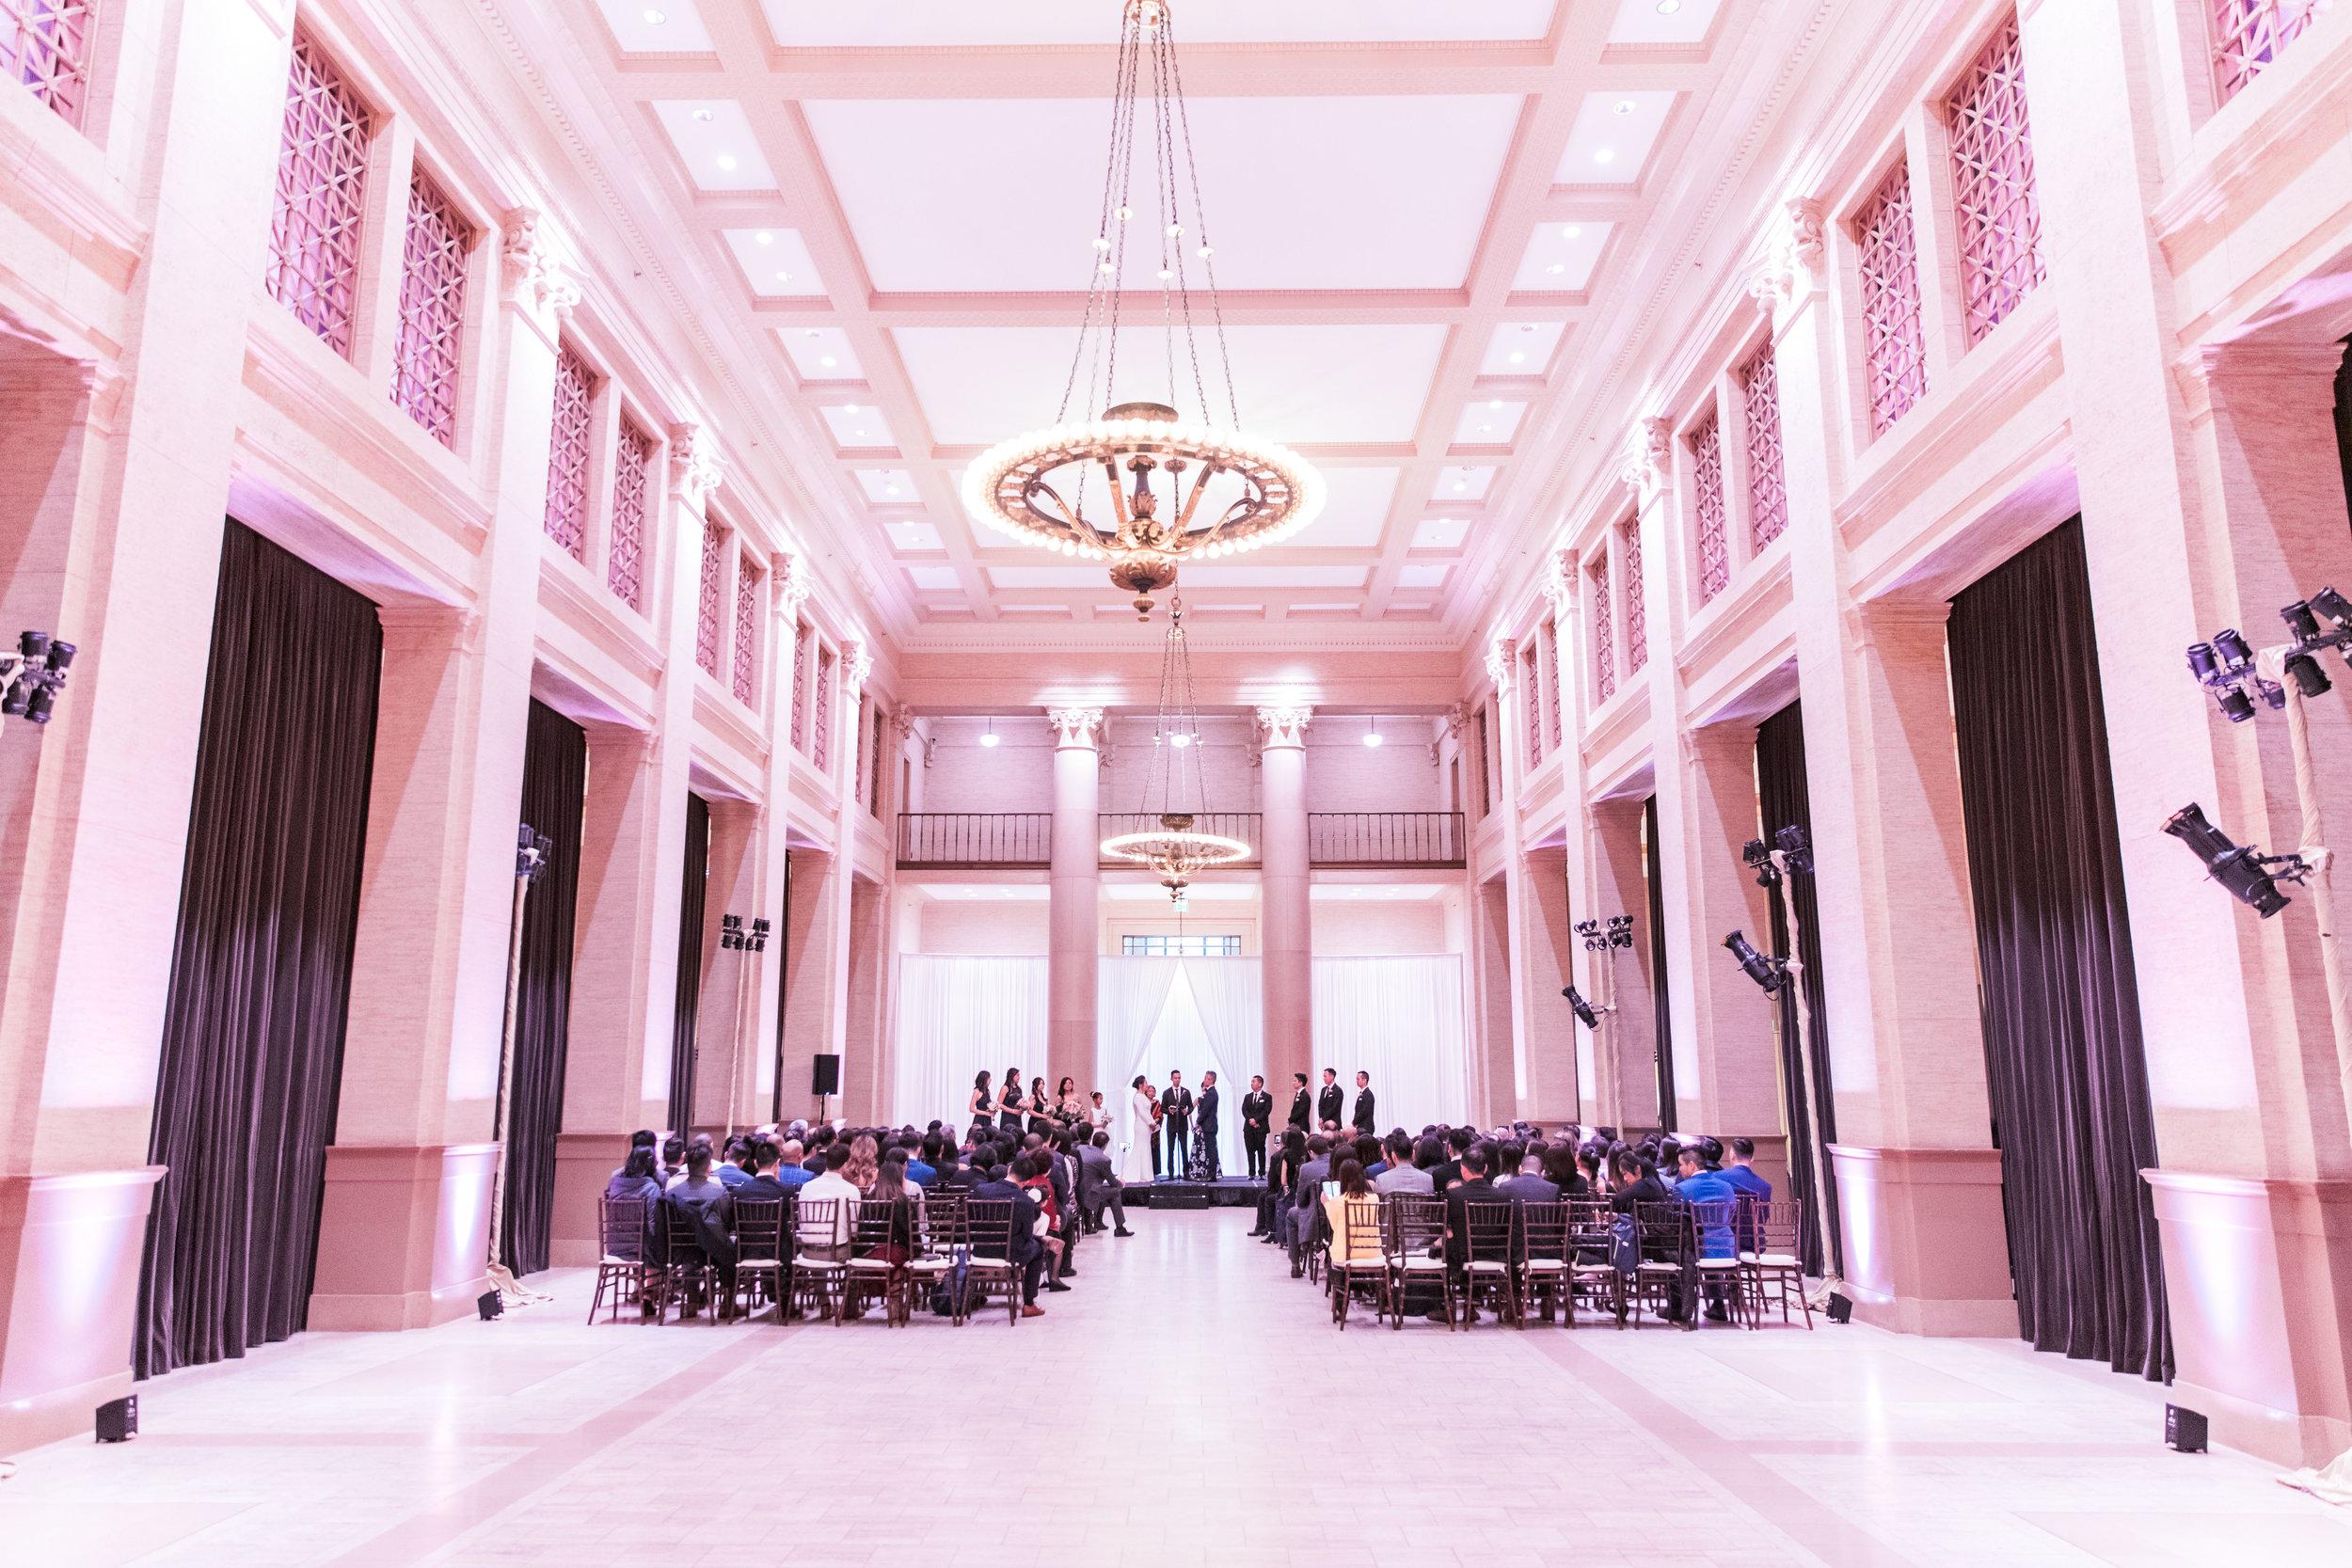 Marina-Eugene-Wedding-by-JBJ-Pictures-208.jpg